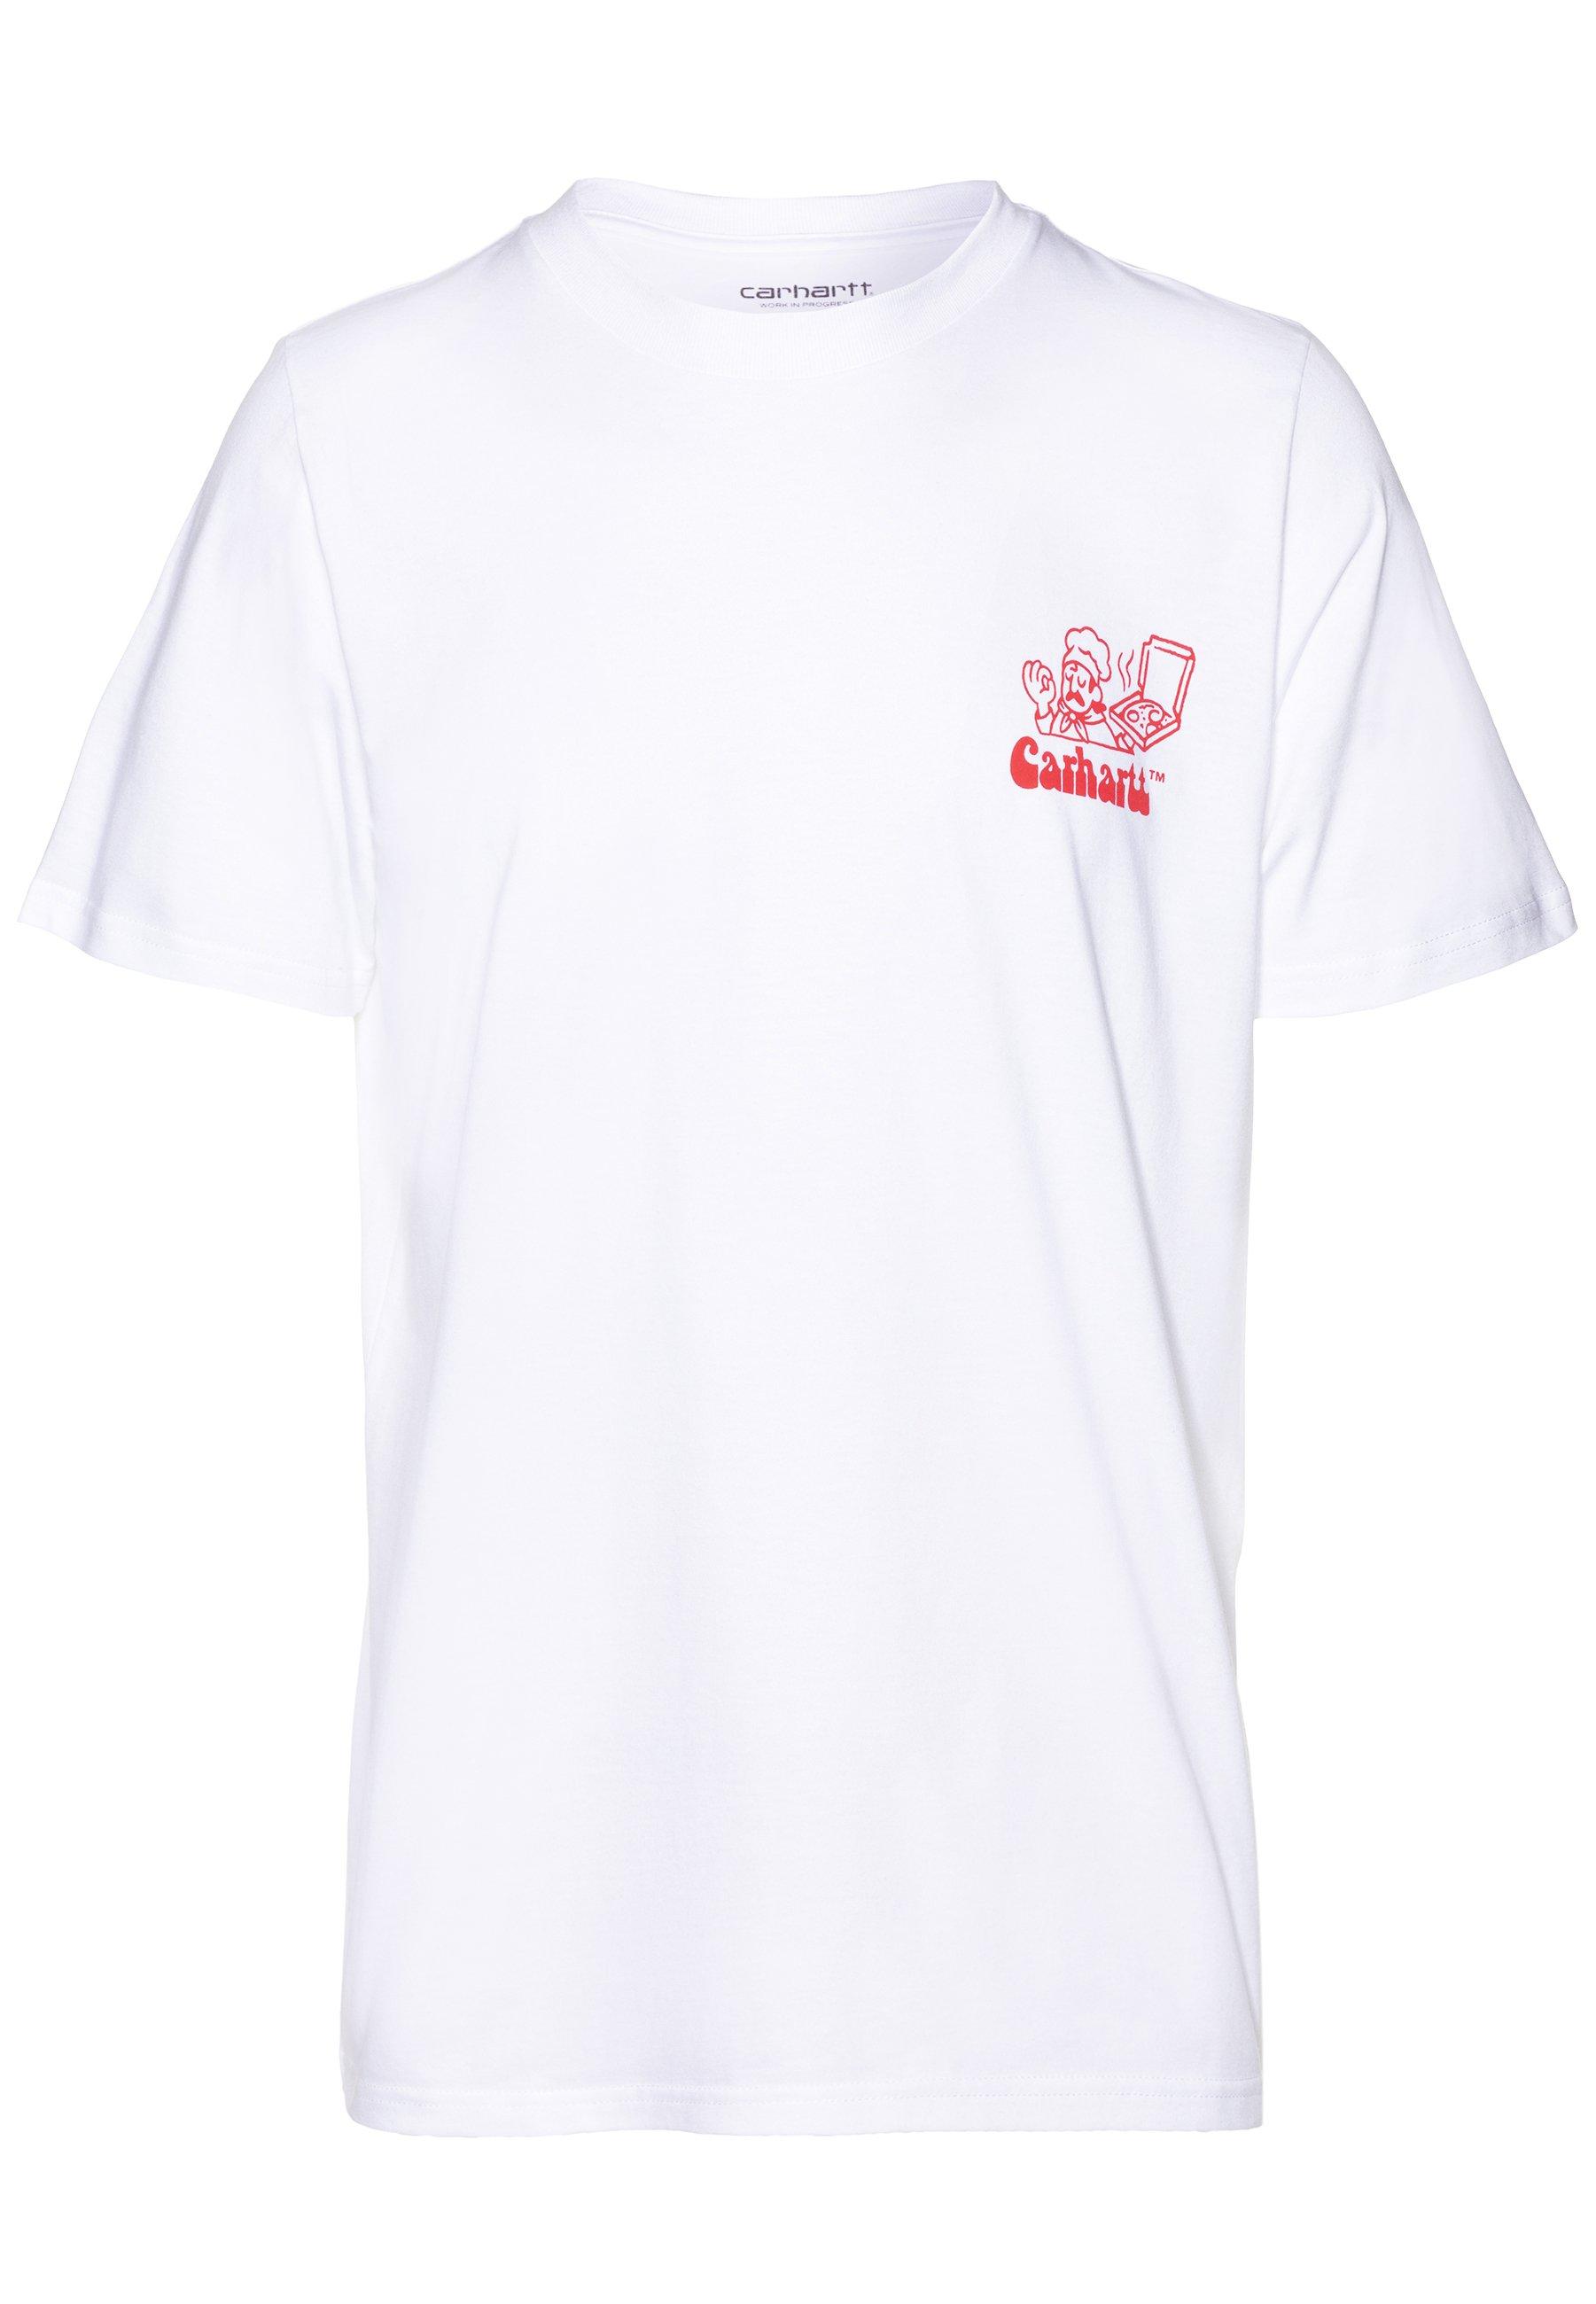 Tiranía Ananiver tolerancia  Carhartt WIP BENE - Camiseta estampada - white/red/blanco - Zalando.es